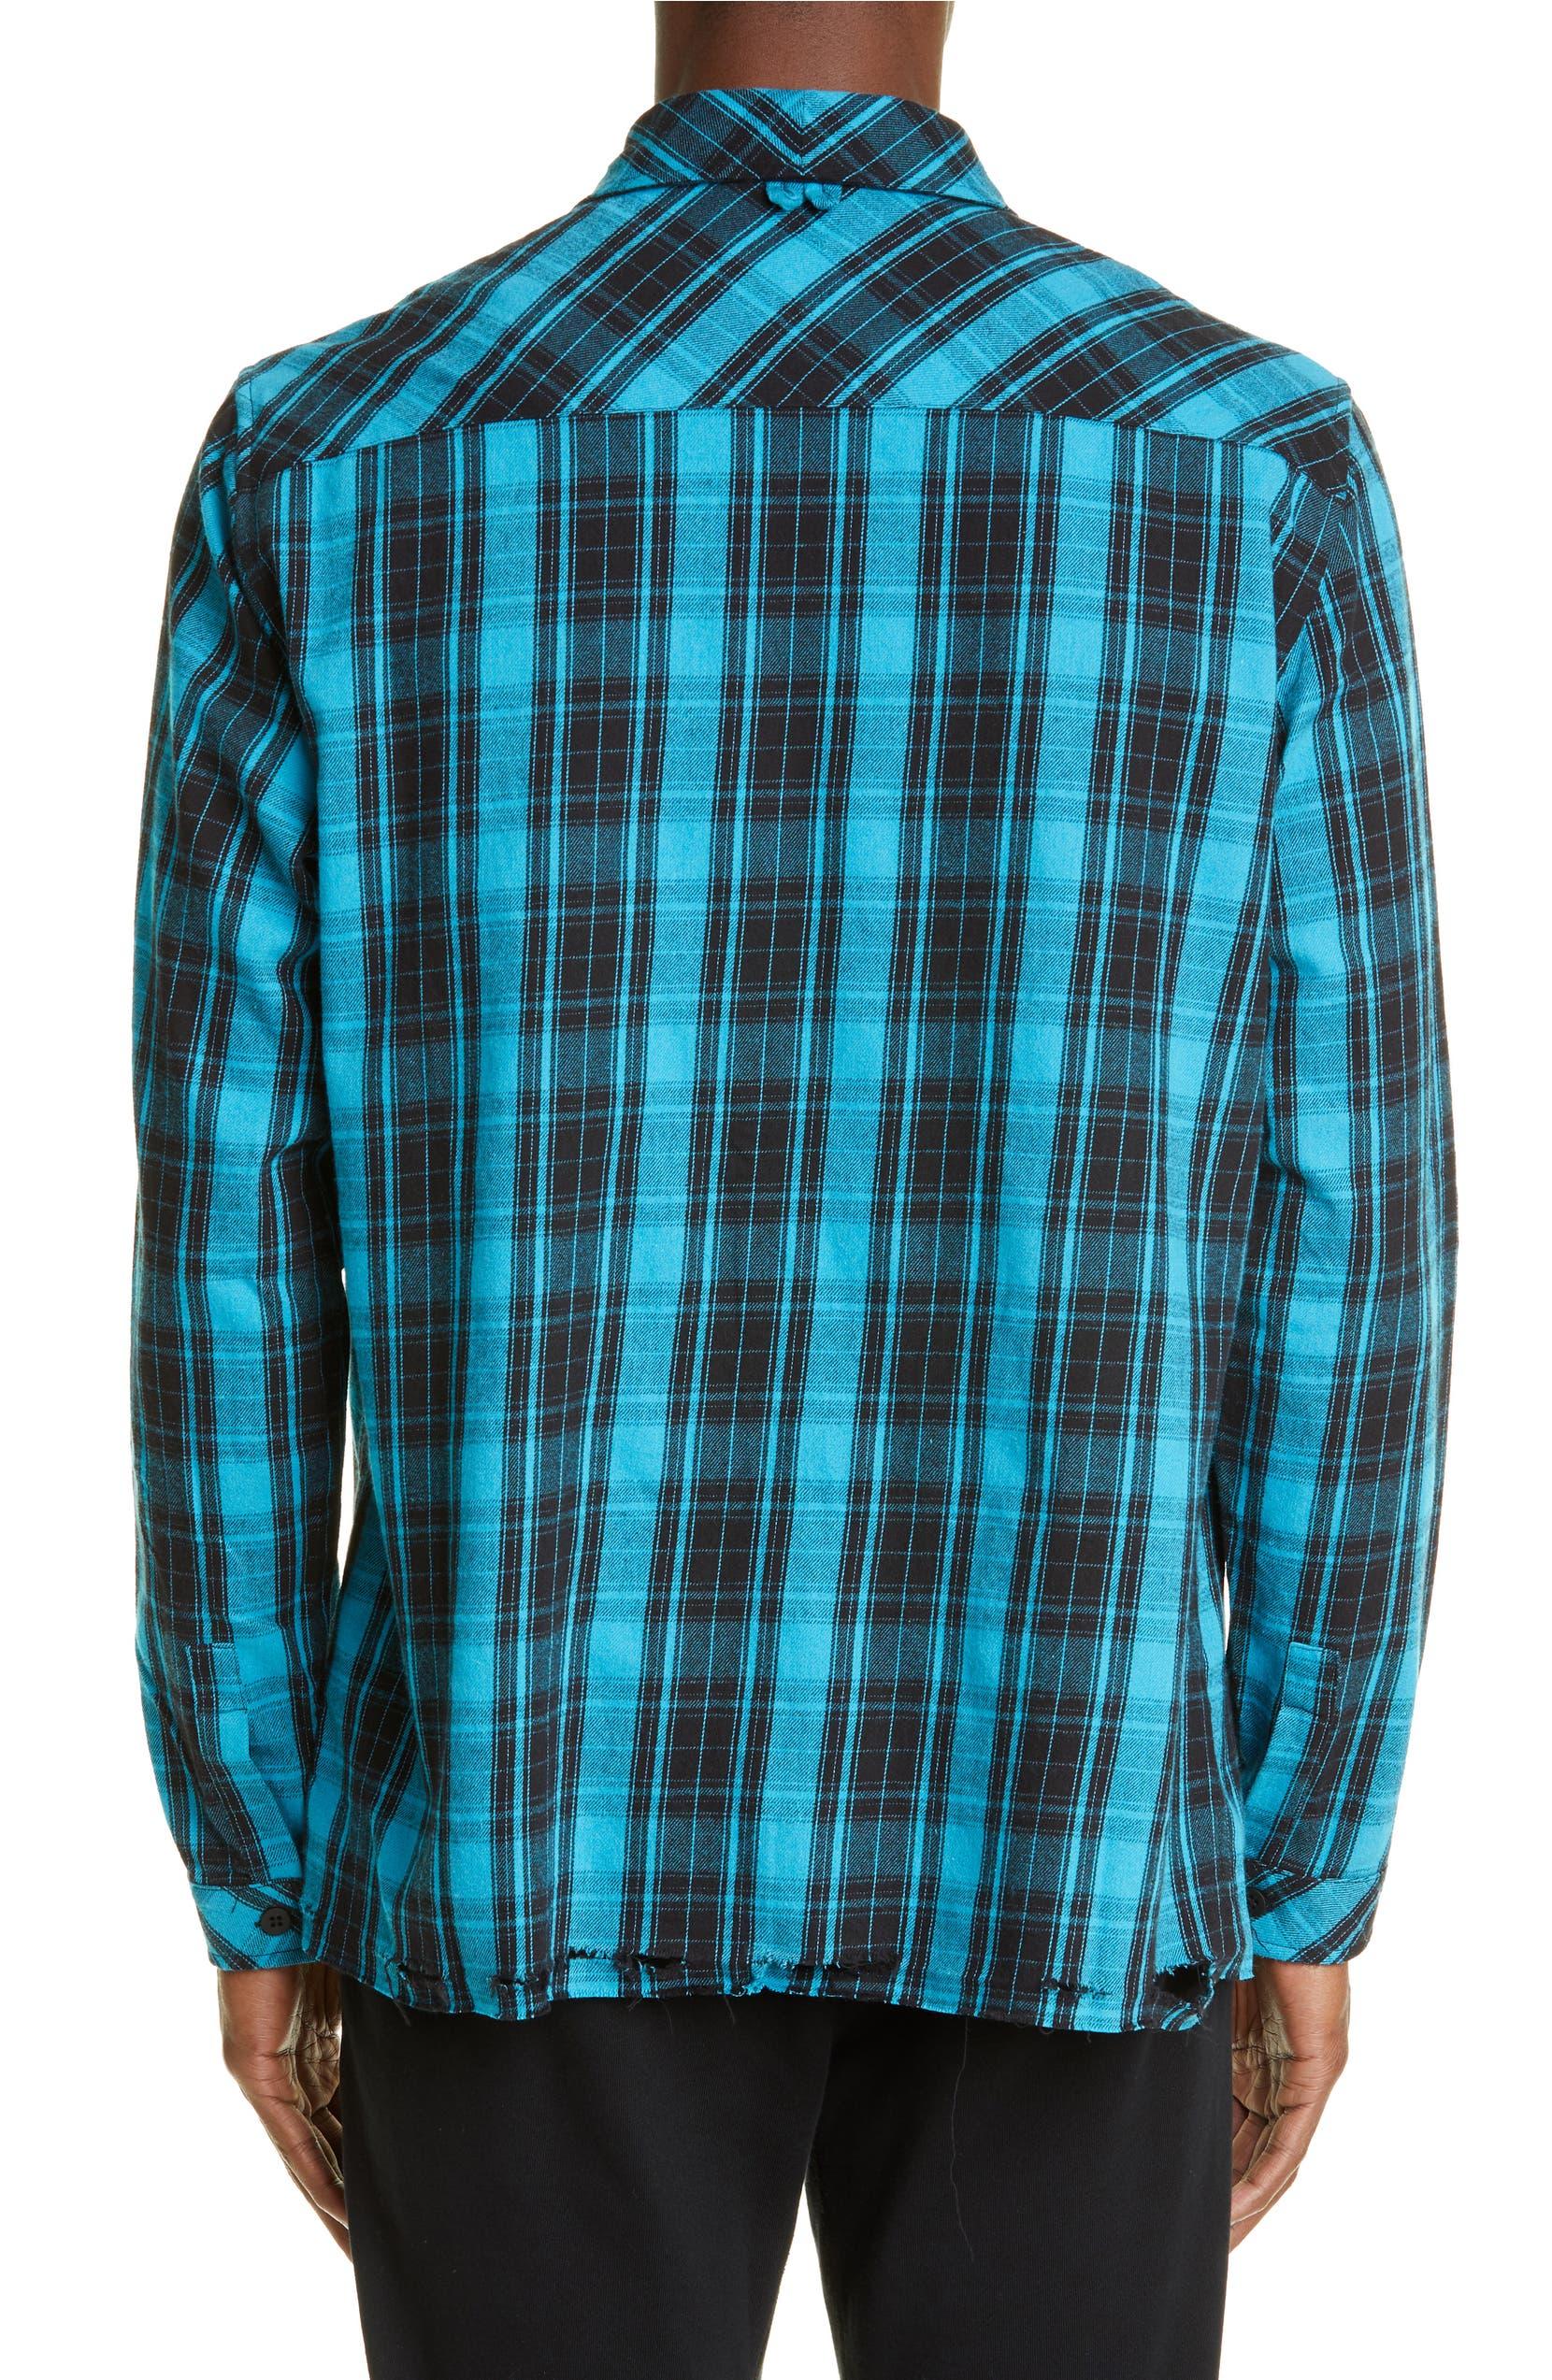 955b87650ce0 Marcelo Burlon County Check Plaid Button-Up Flannel Shirt | Nordstrom